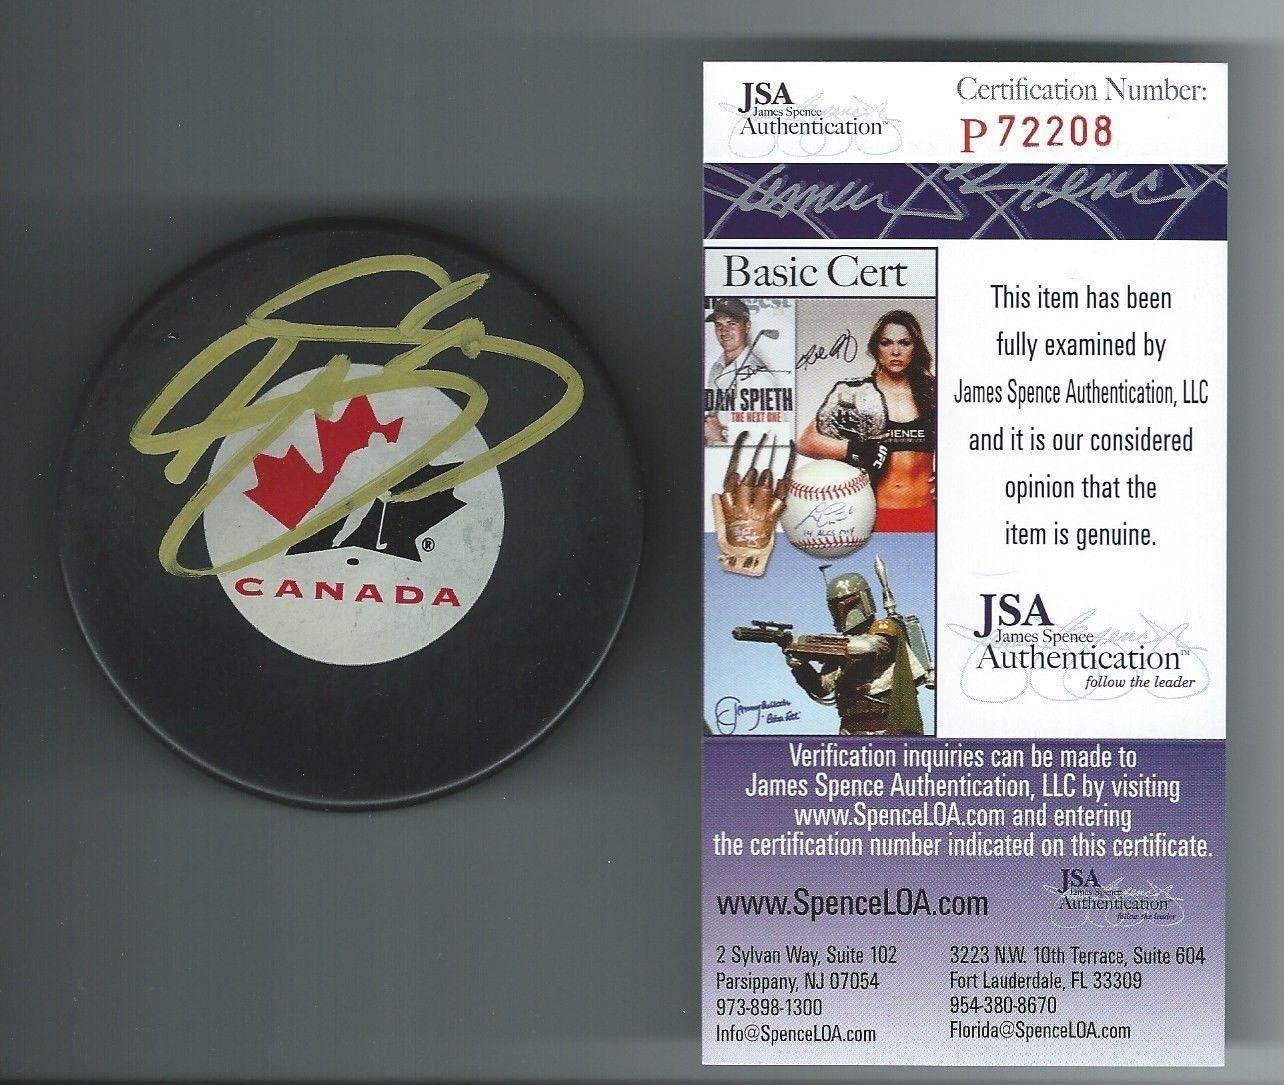 Joe Sakic Signed Team Canada Puck Colorado Avalanche Jsa Authenticated P72208 - Autographed NHL Pucks